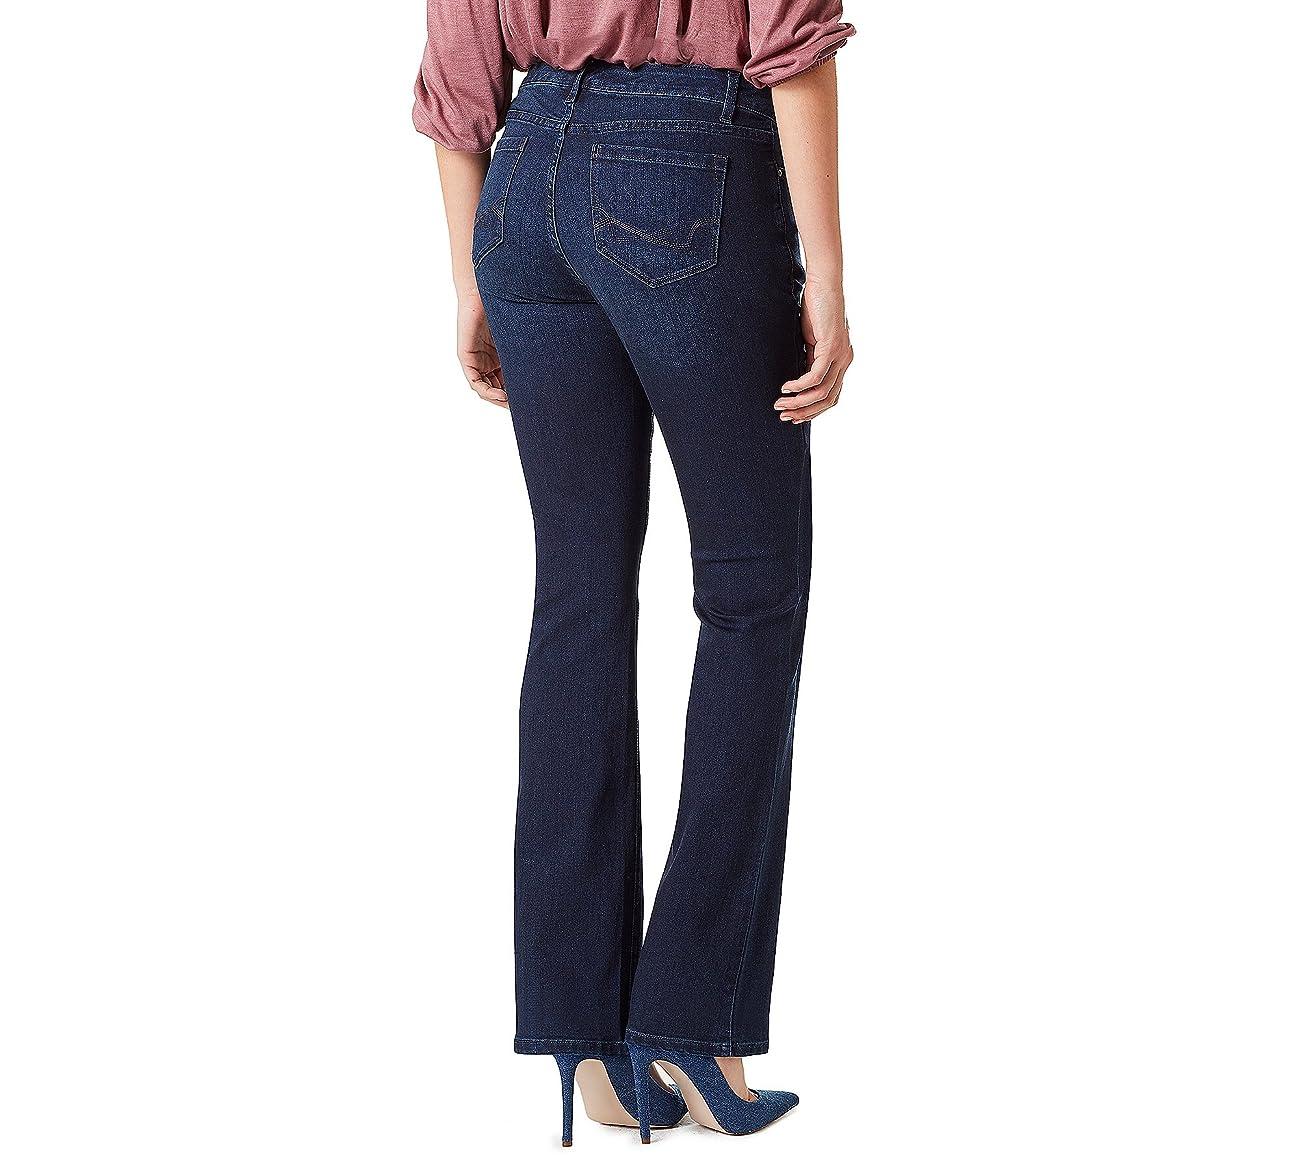 Vintage America Boho Bootcut Jeans 1